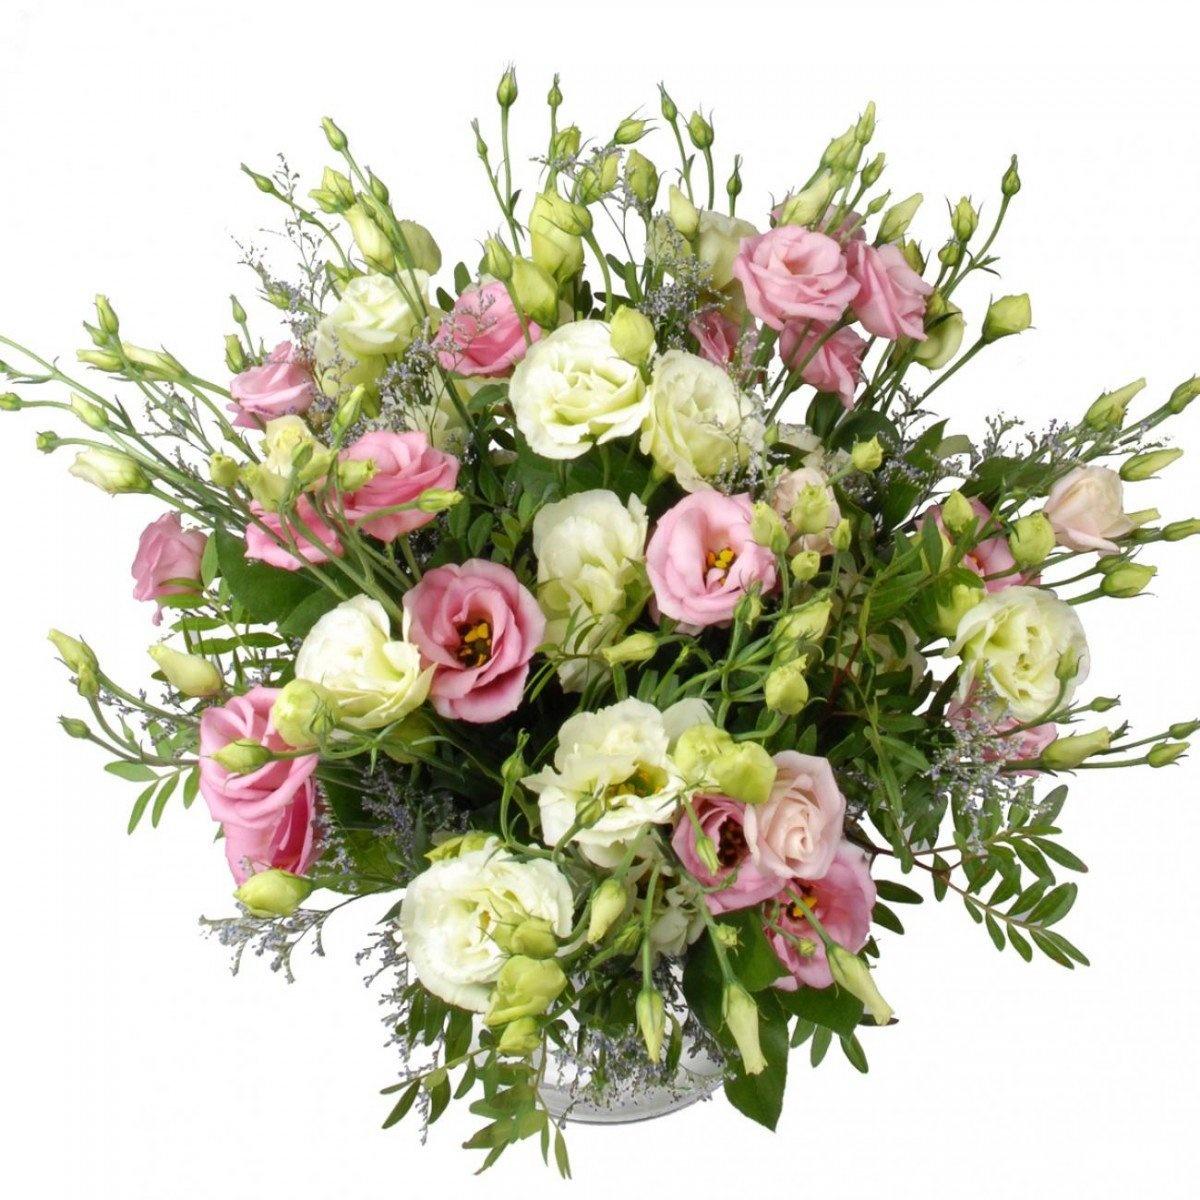 Букет китайских роз фото, цветов красноярску край